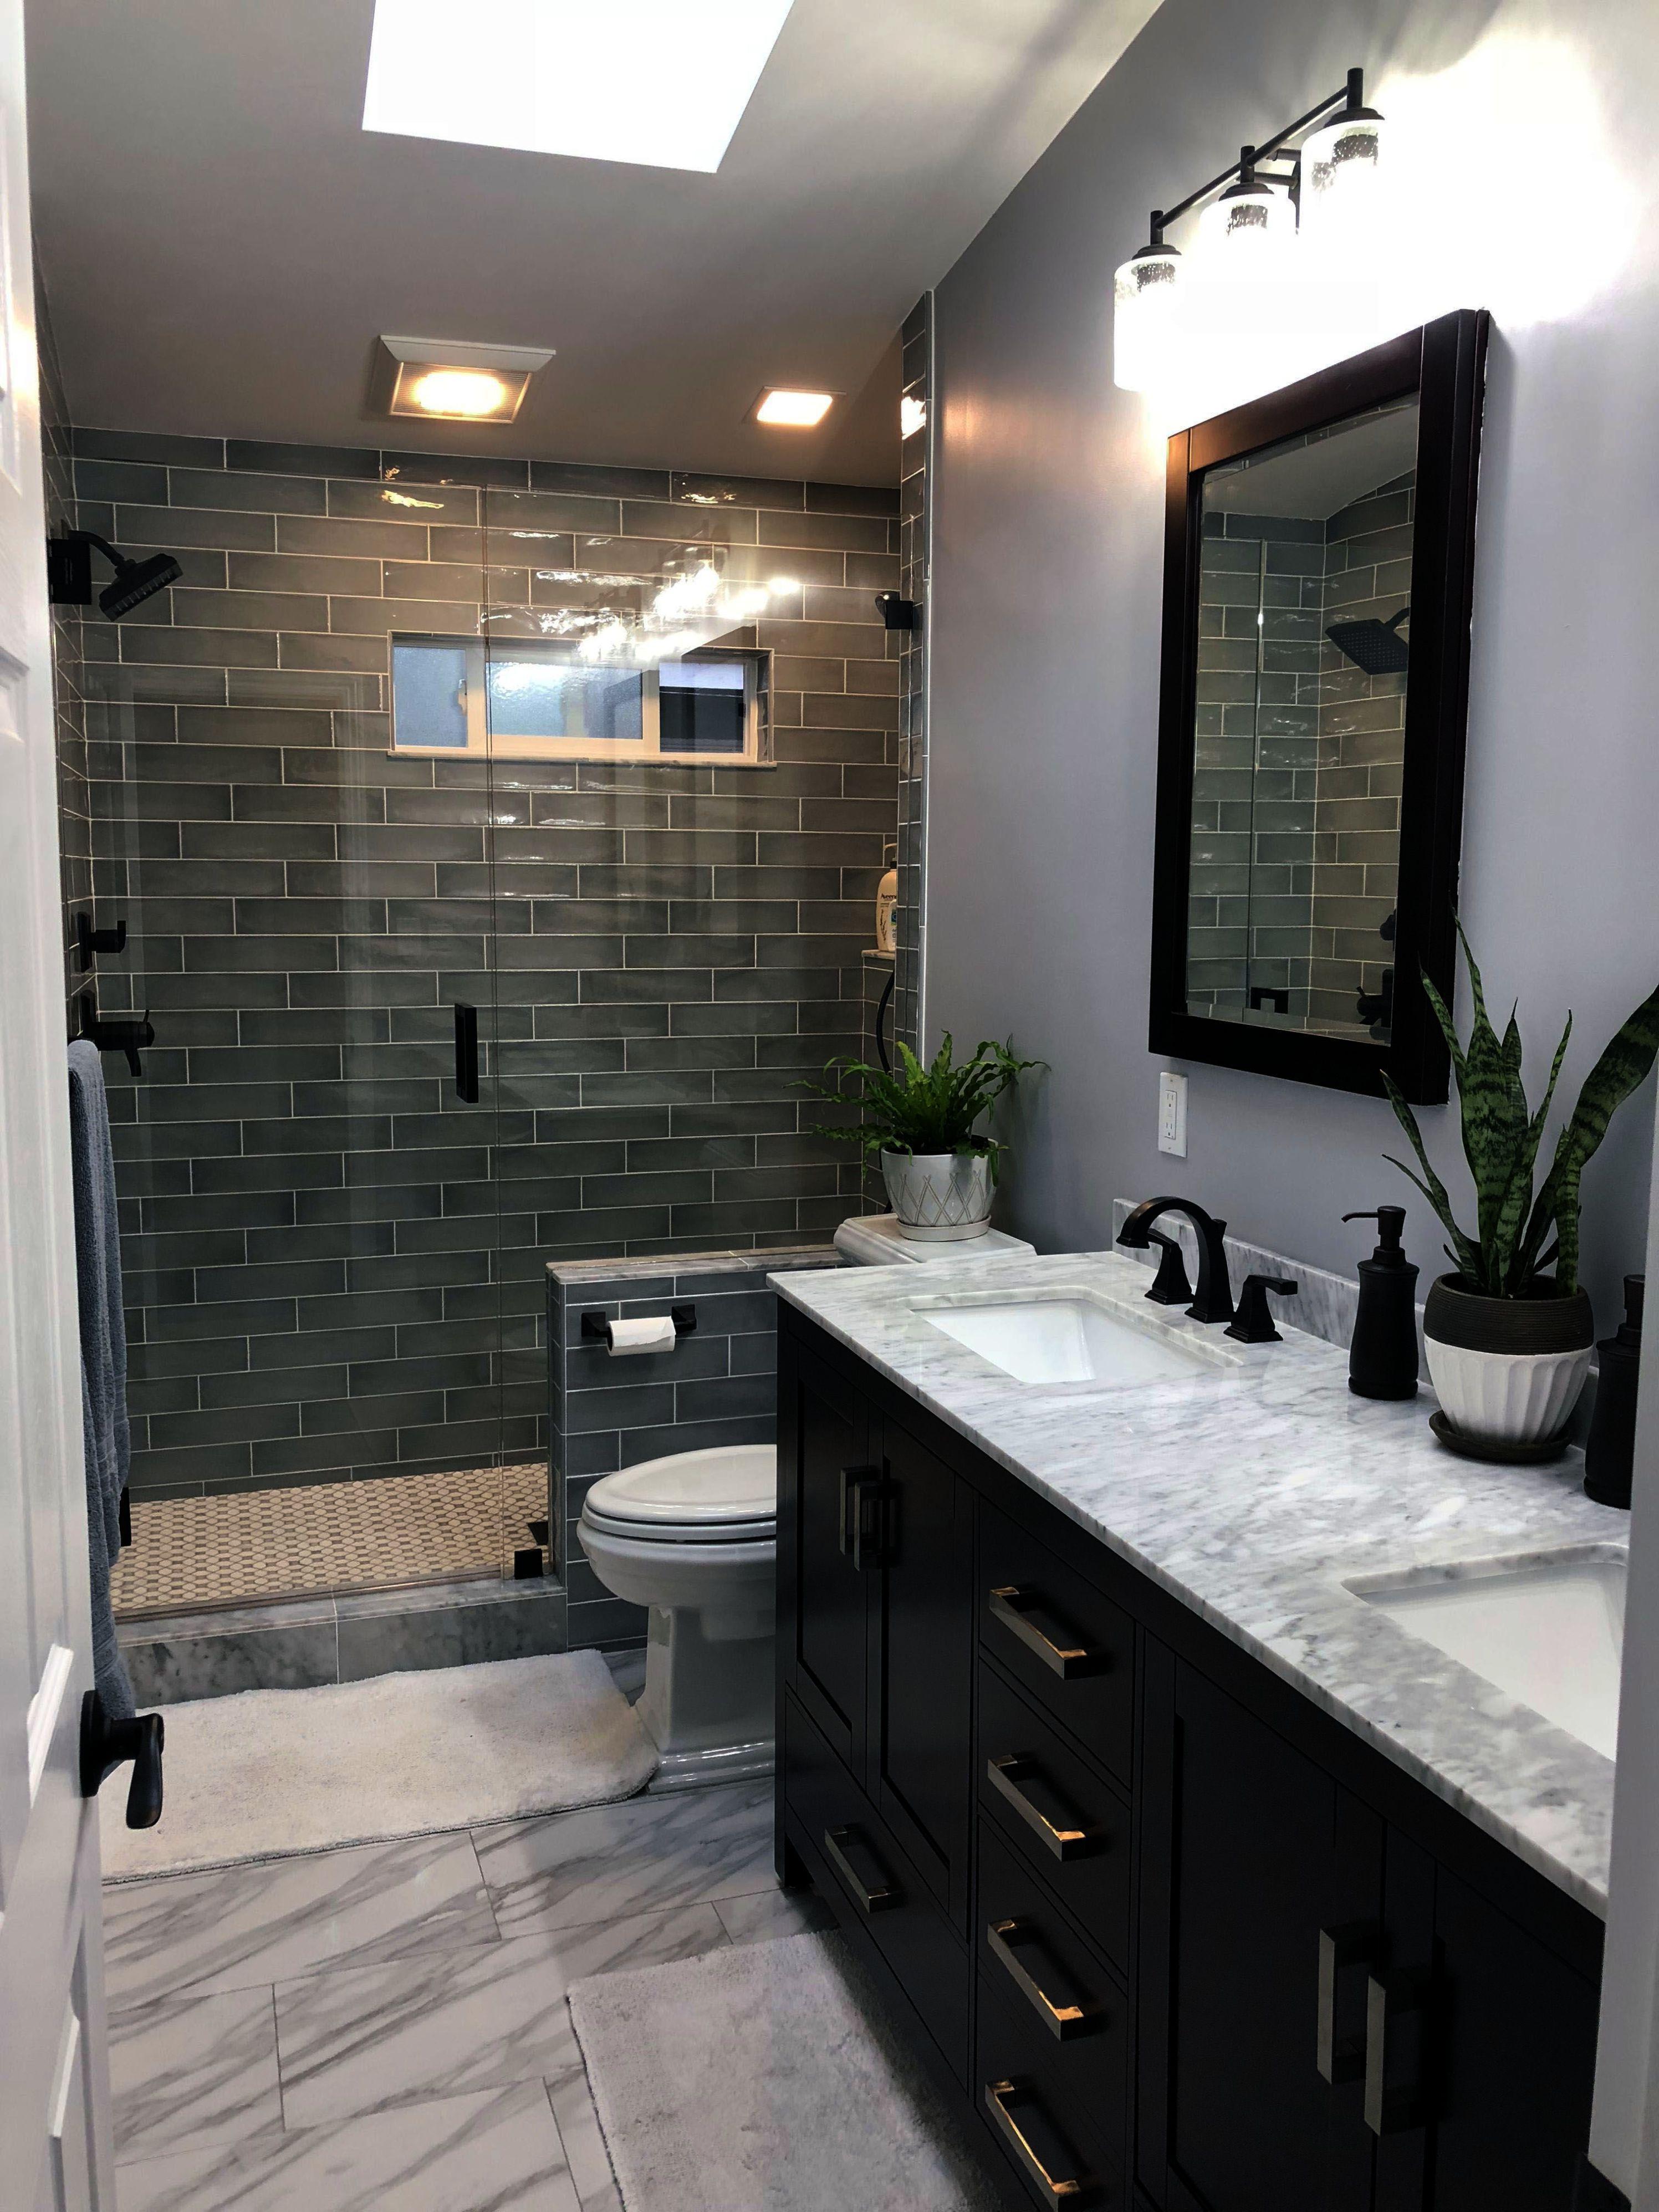 Small Bathroom Renovation Cost Perth Bathroom Ideas Simple Within Bathroom Cabinets Gumtree Small Bathroom Remodel Small Master Bathroom Bathroom Tile Designs